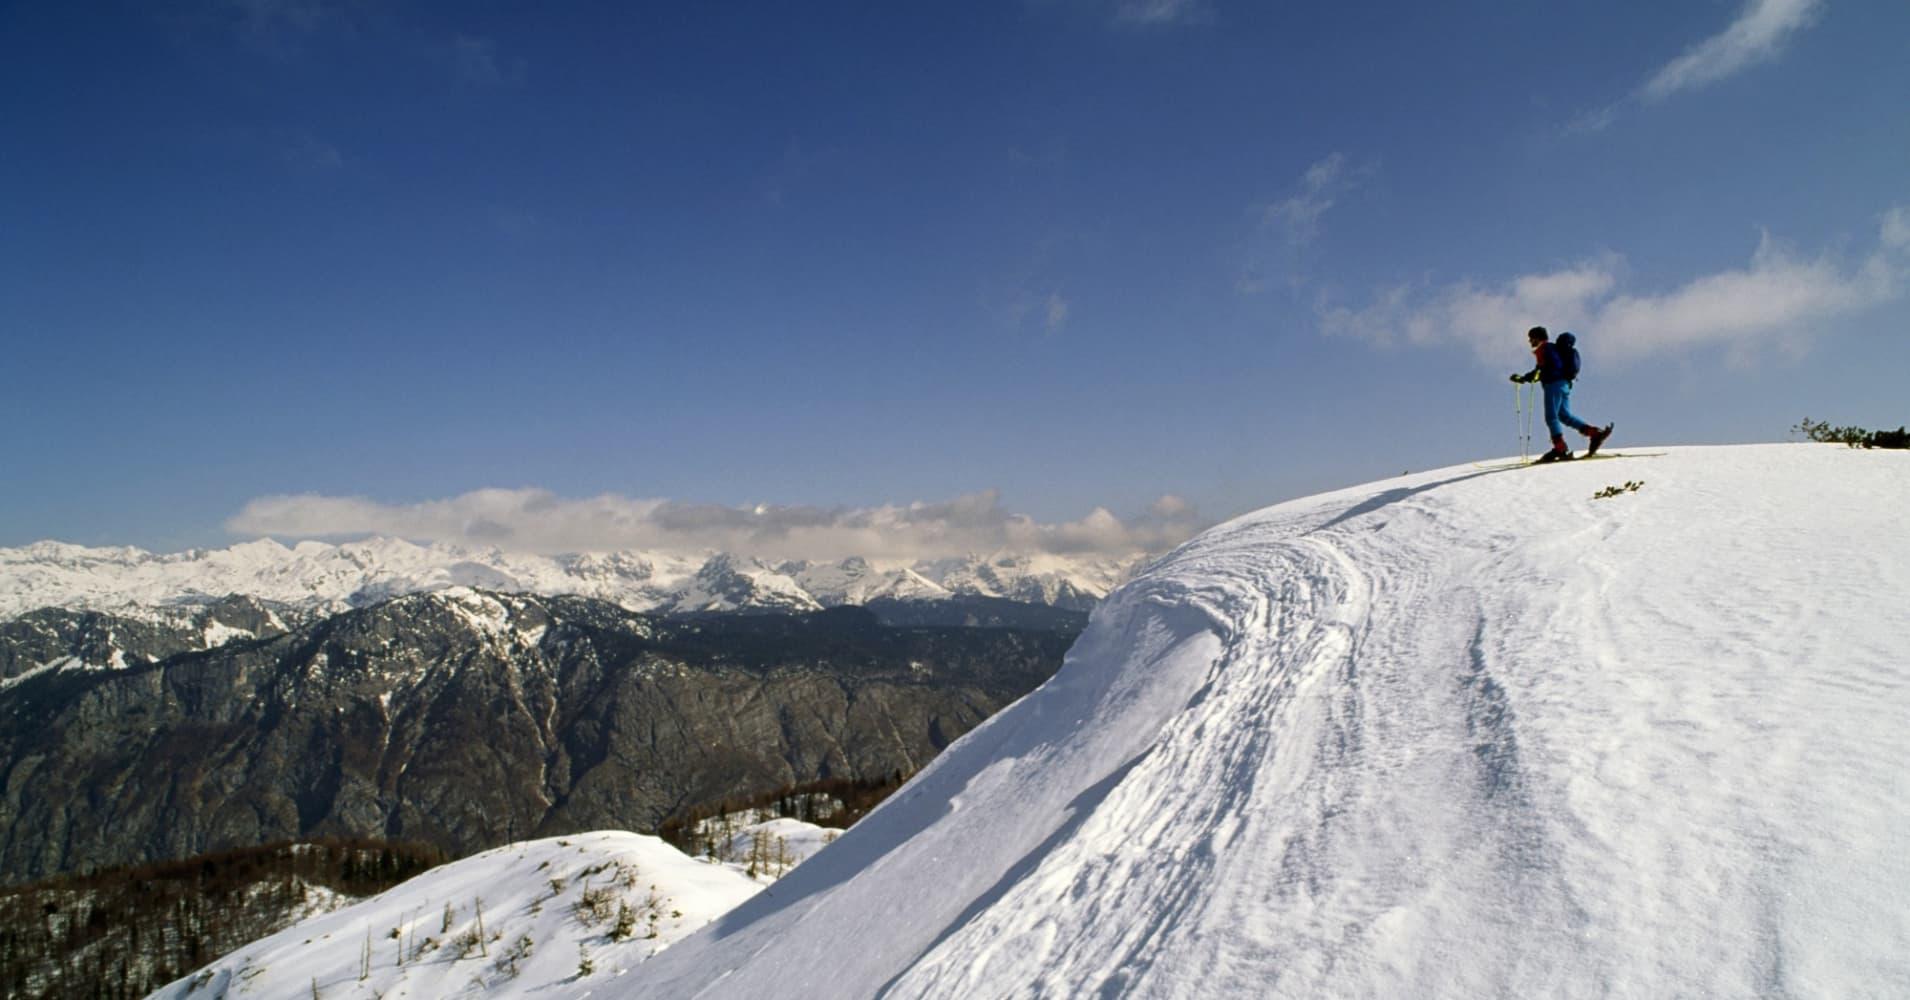 Ski-mountaineering in the Triglav national park, Slovenia.